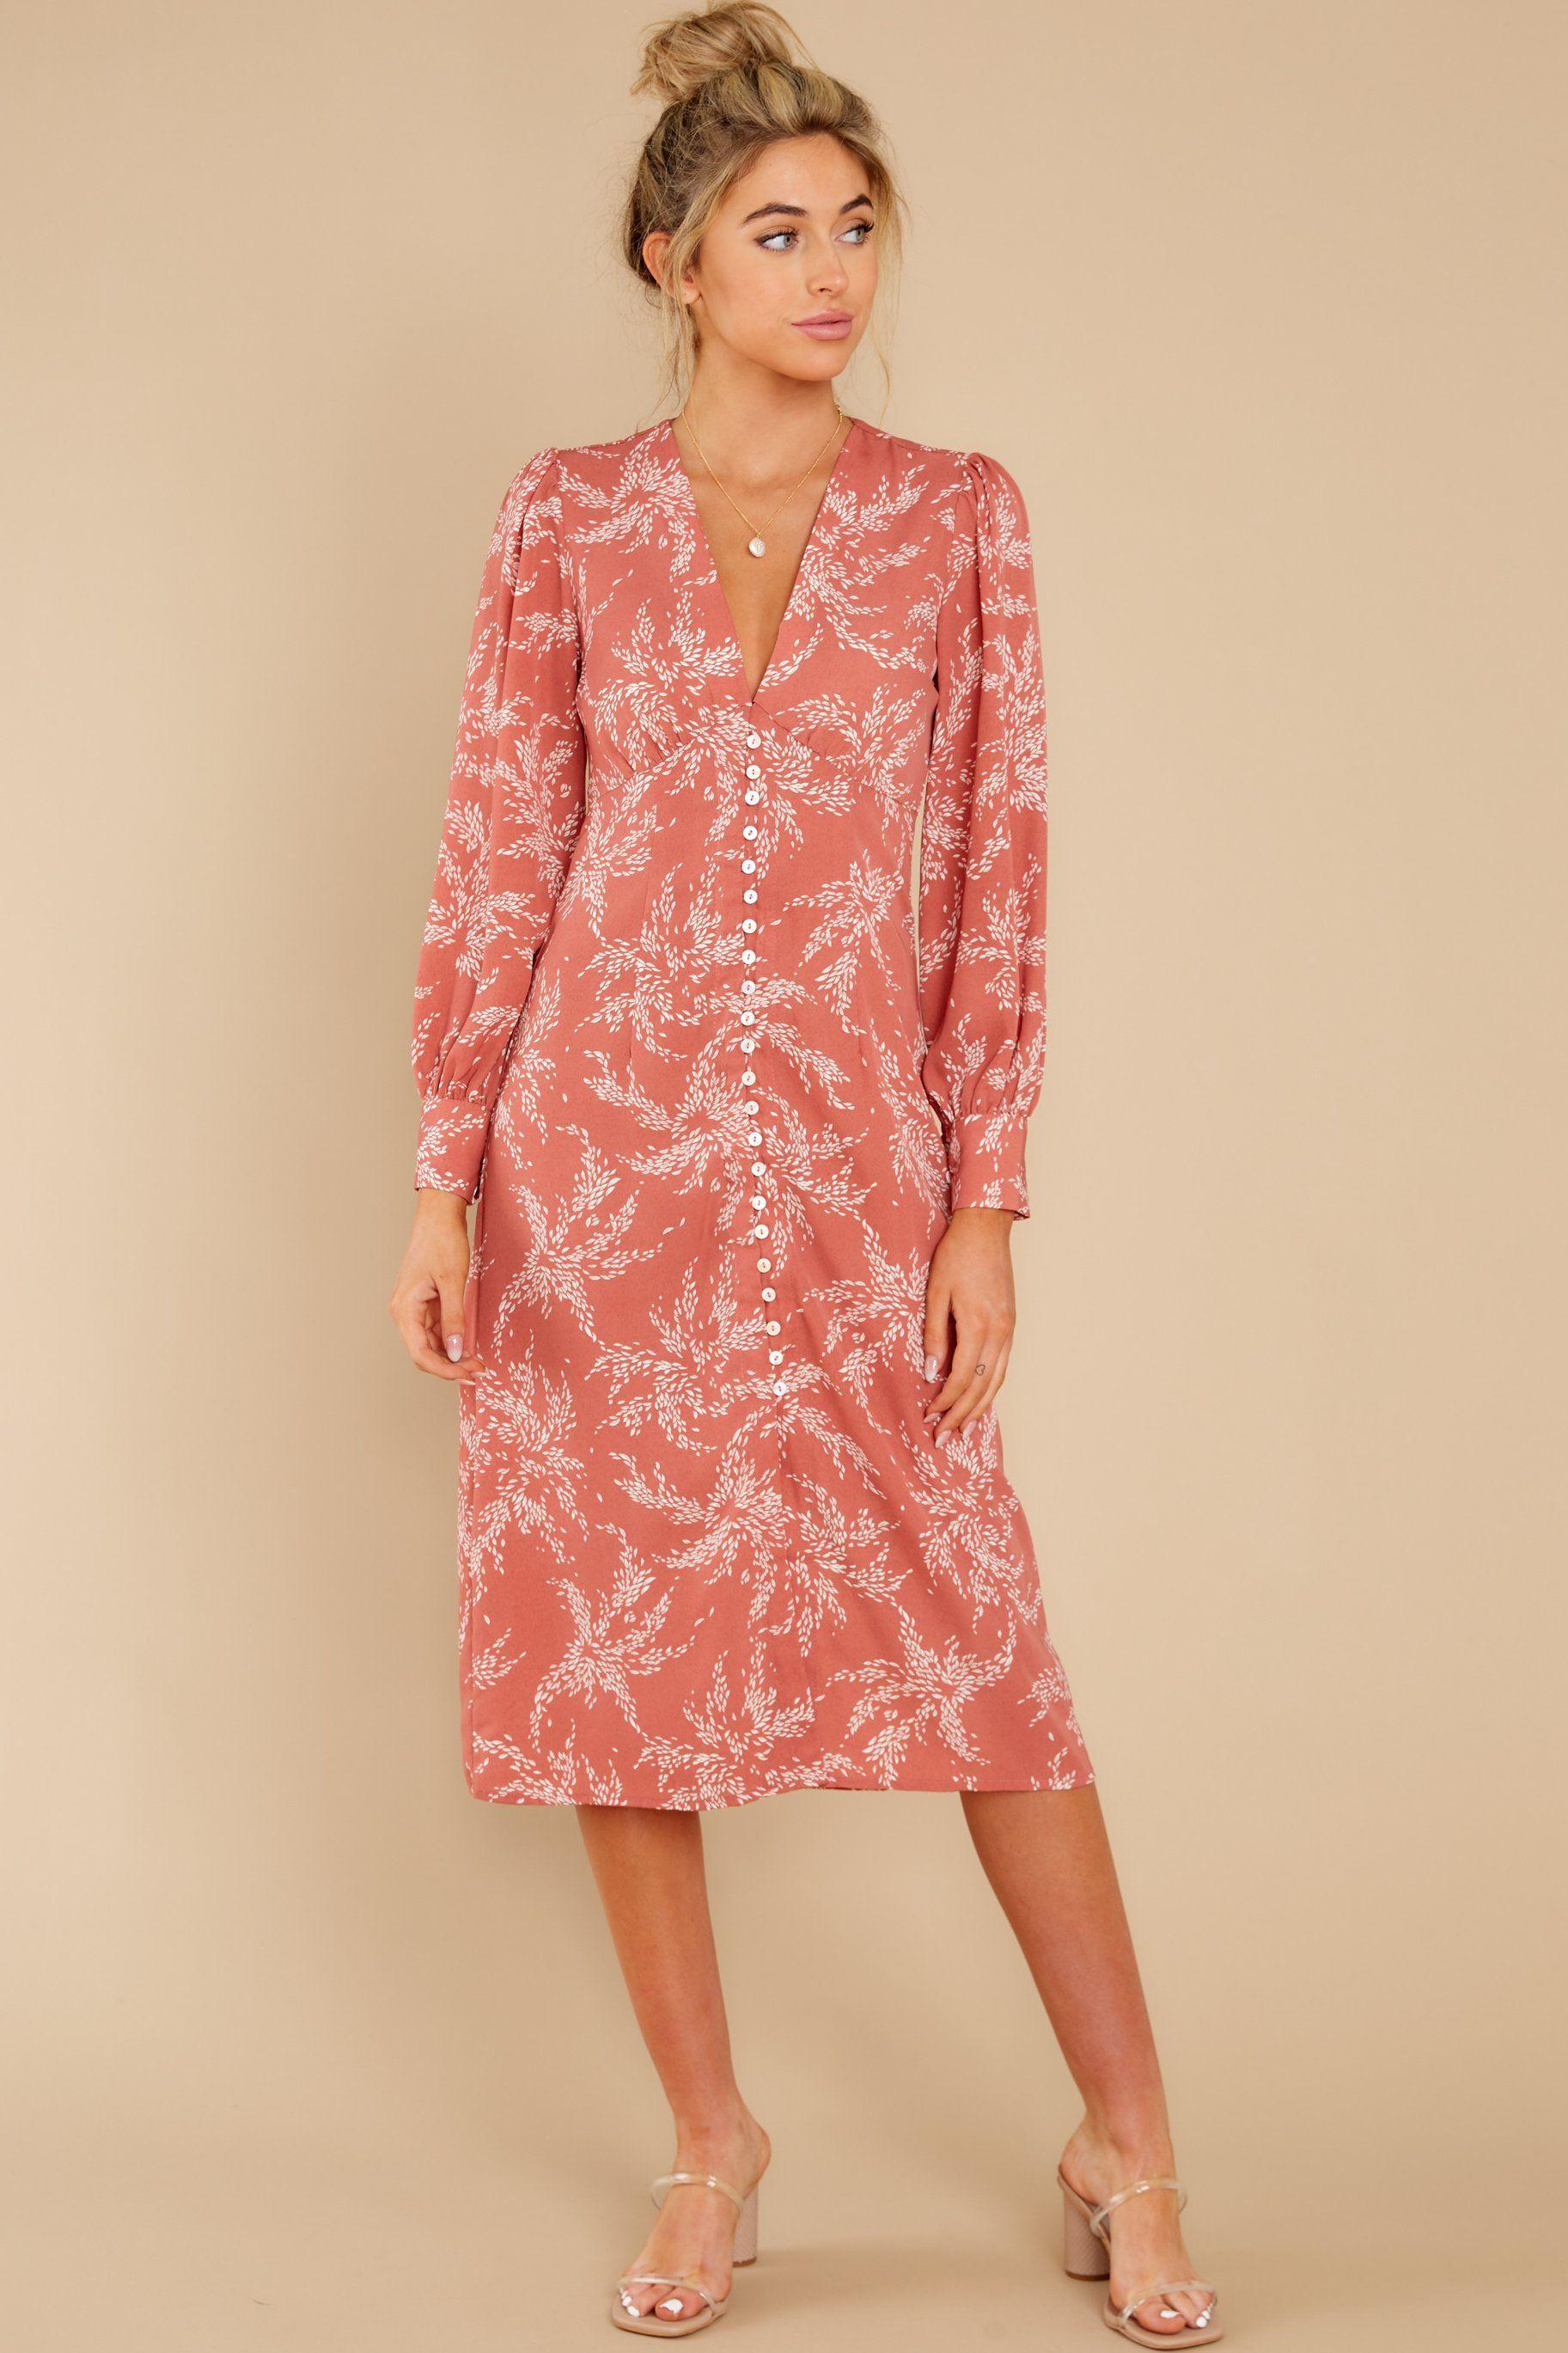 Stylish Pink Dress Printed V Neck Button Up Midi Dress 46 Red Dress Red Dress Women Pink Print Dress [ 2738 x 1825 Pixel ]